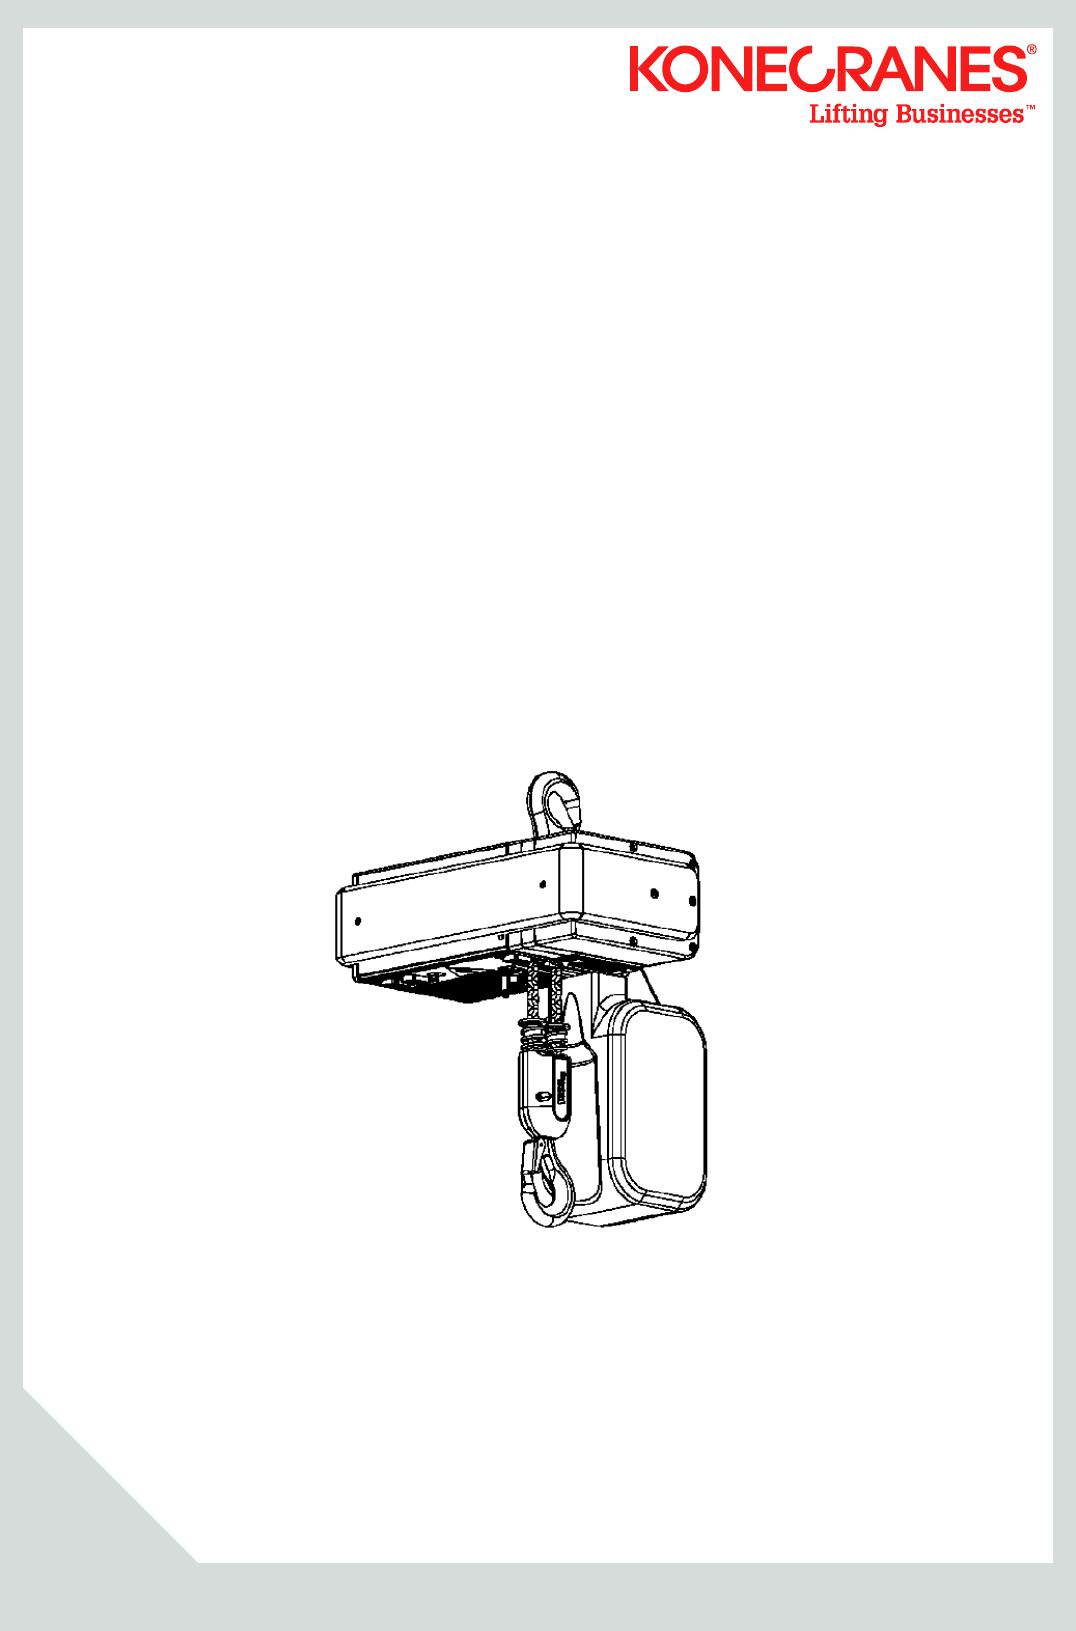 XN10 I&M MANUAL 2010 0 Kone Cranes Hoist Kone Hoist Wiring Diagram on